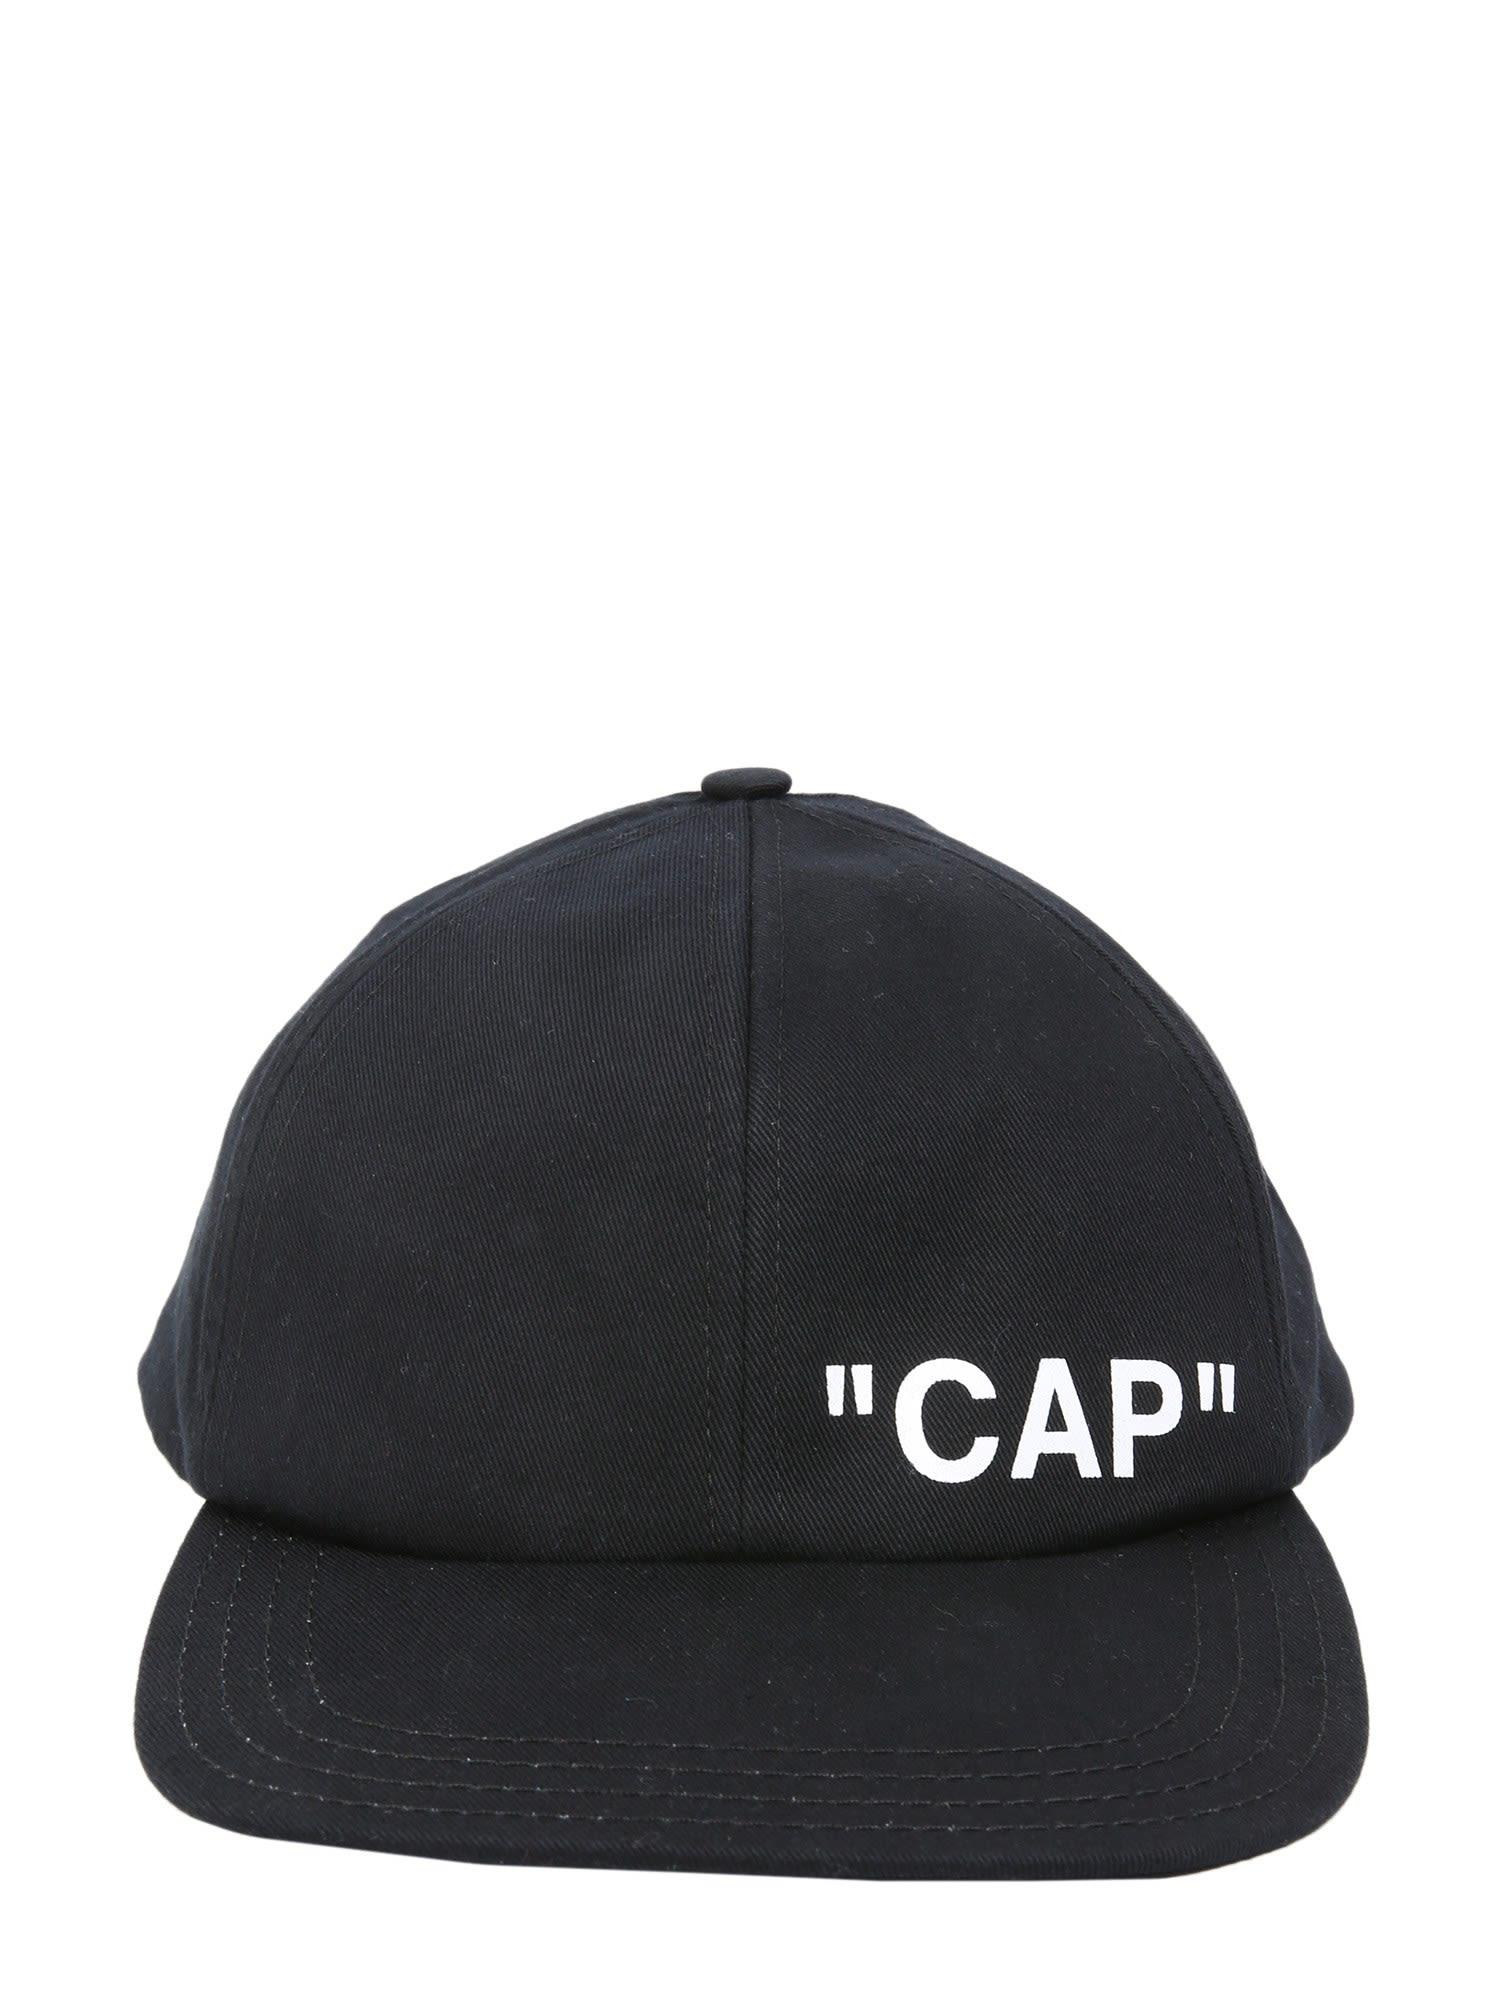 OFF-WHITE QUOTE BASEBALL CAP